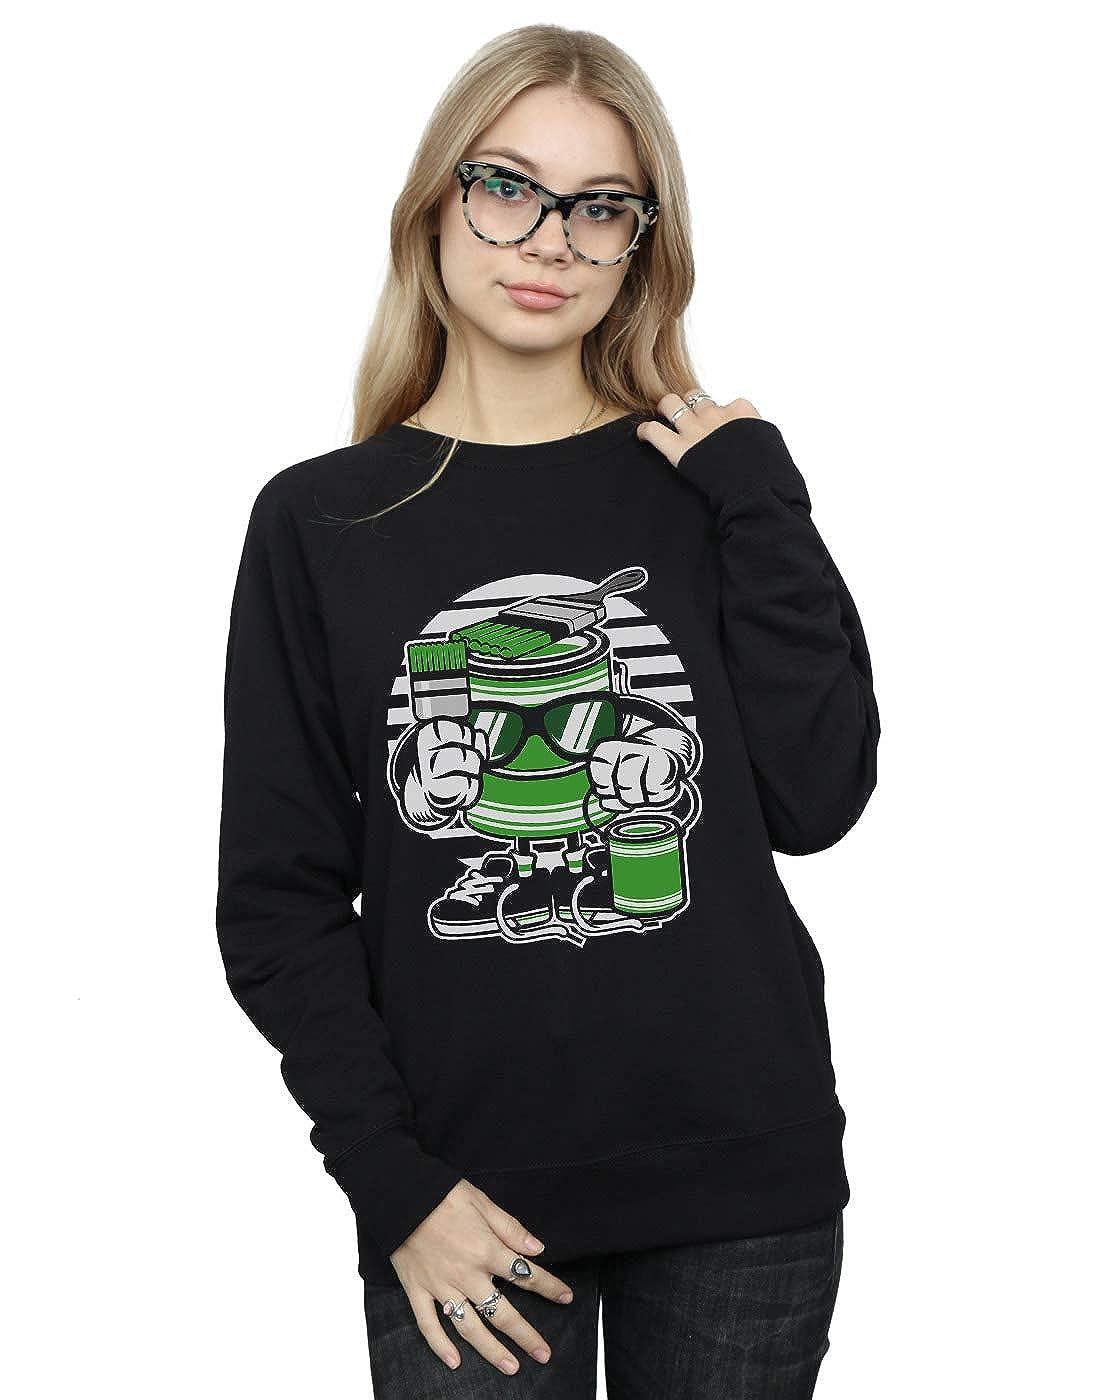 Absolute Cult Drewbacca Womens Lets Paint Sweatshirt